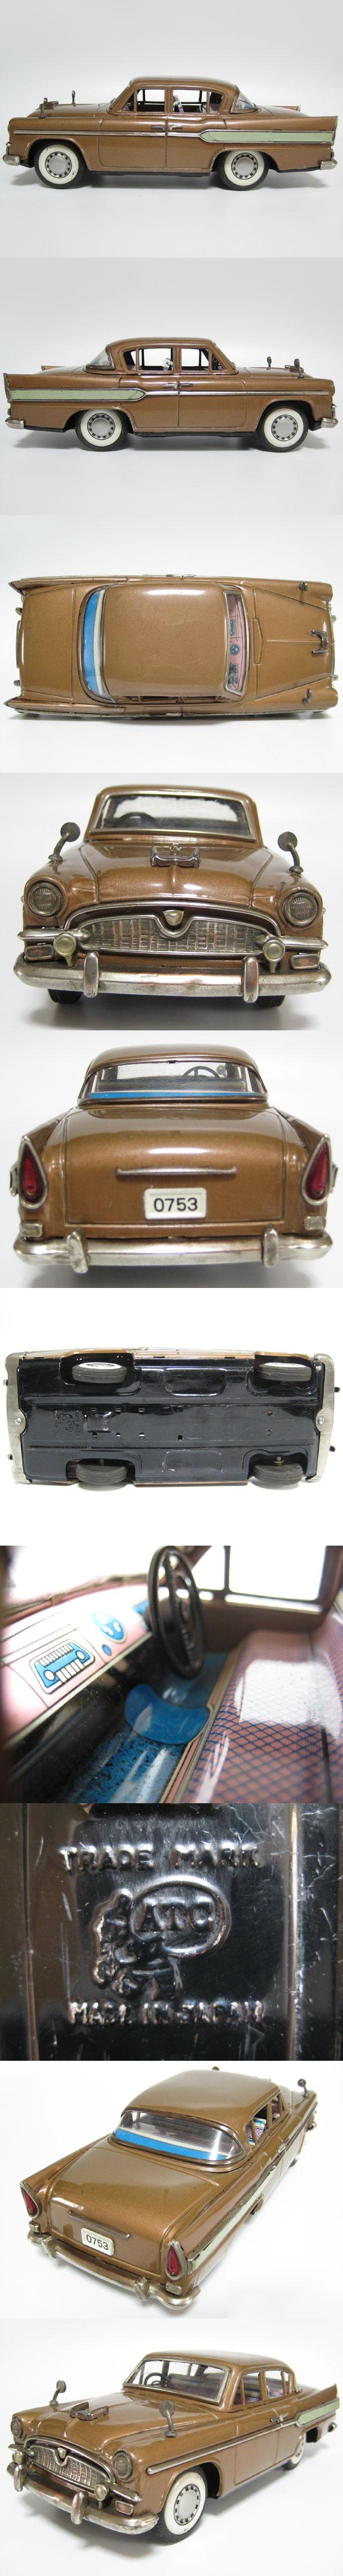 asahi tin toyota crown s30 1960 - brown 02